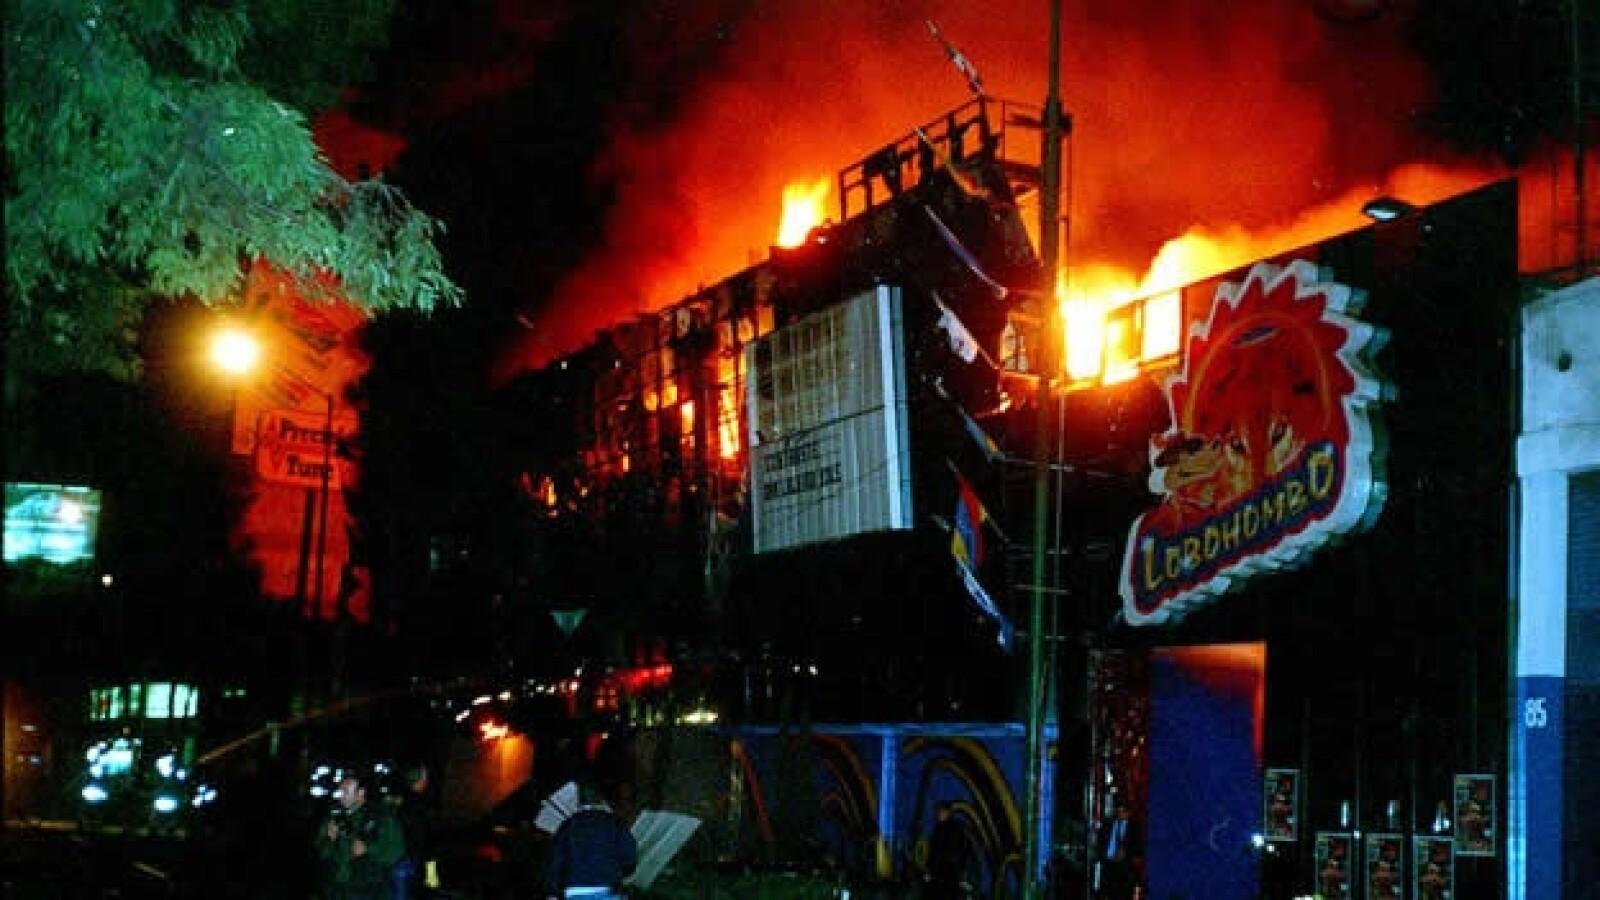 incendio lobohombo 22 muertos